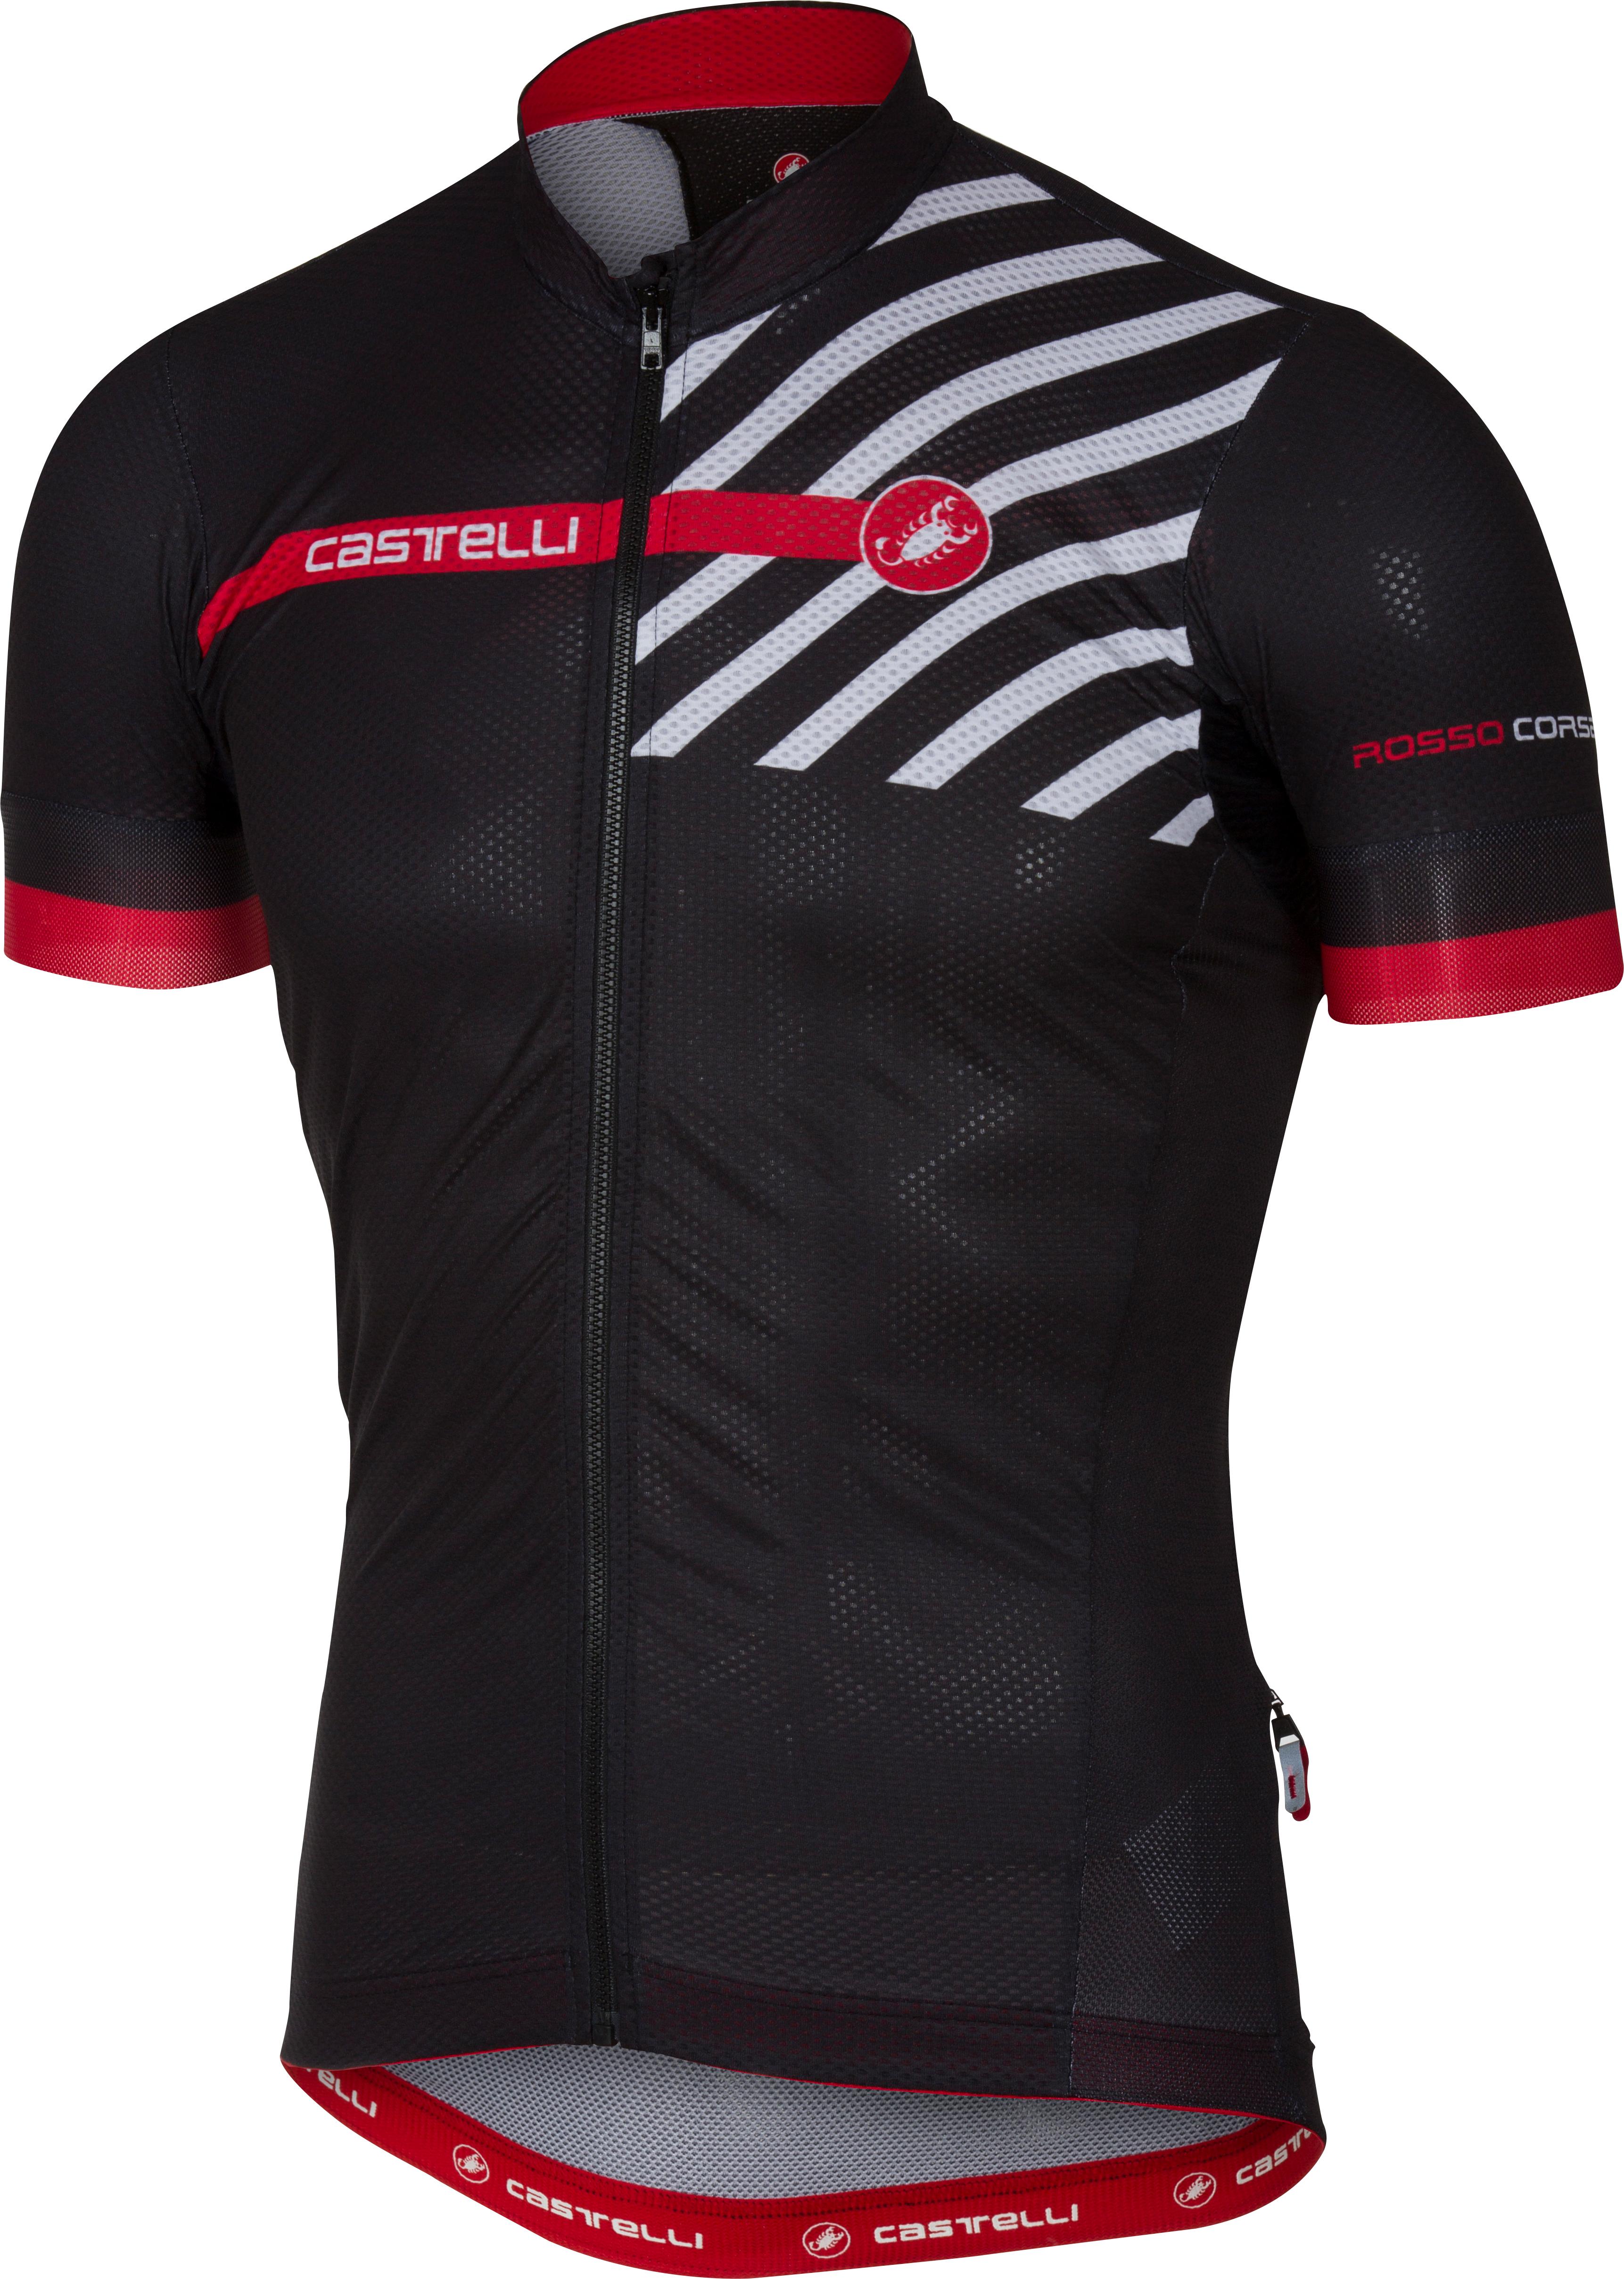 Castelli Free AR 4.1 Mens Short Sleeve Jersey   Black - 700 219413313